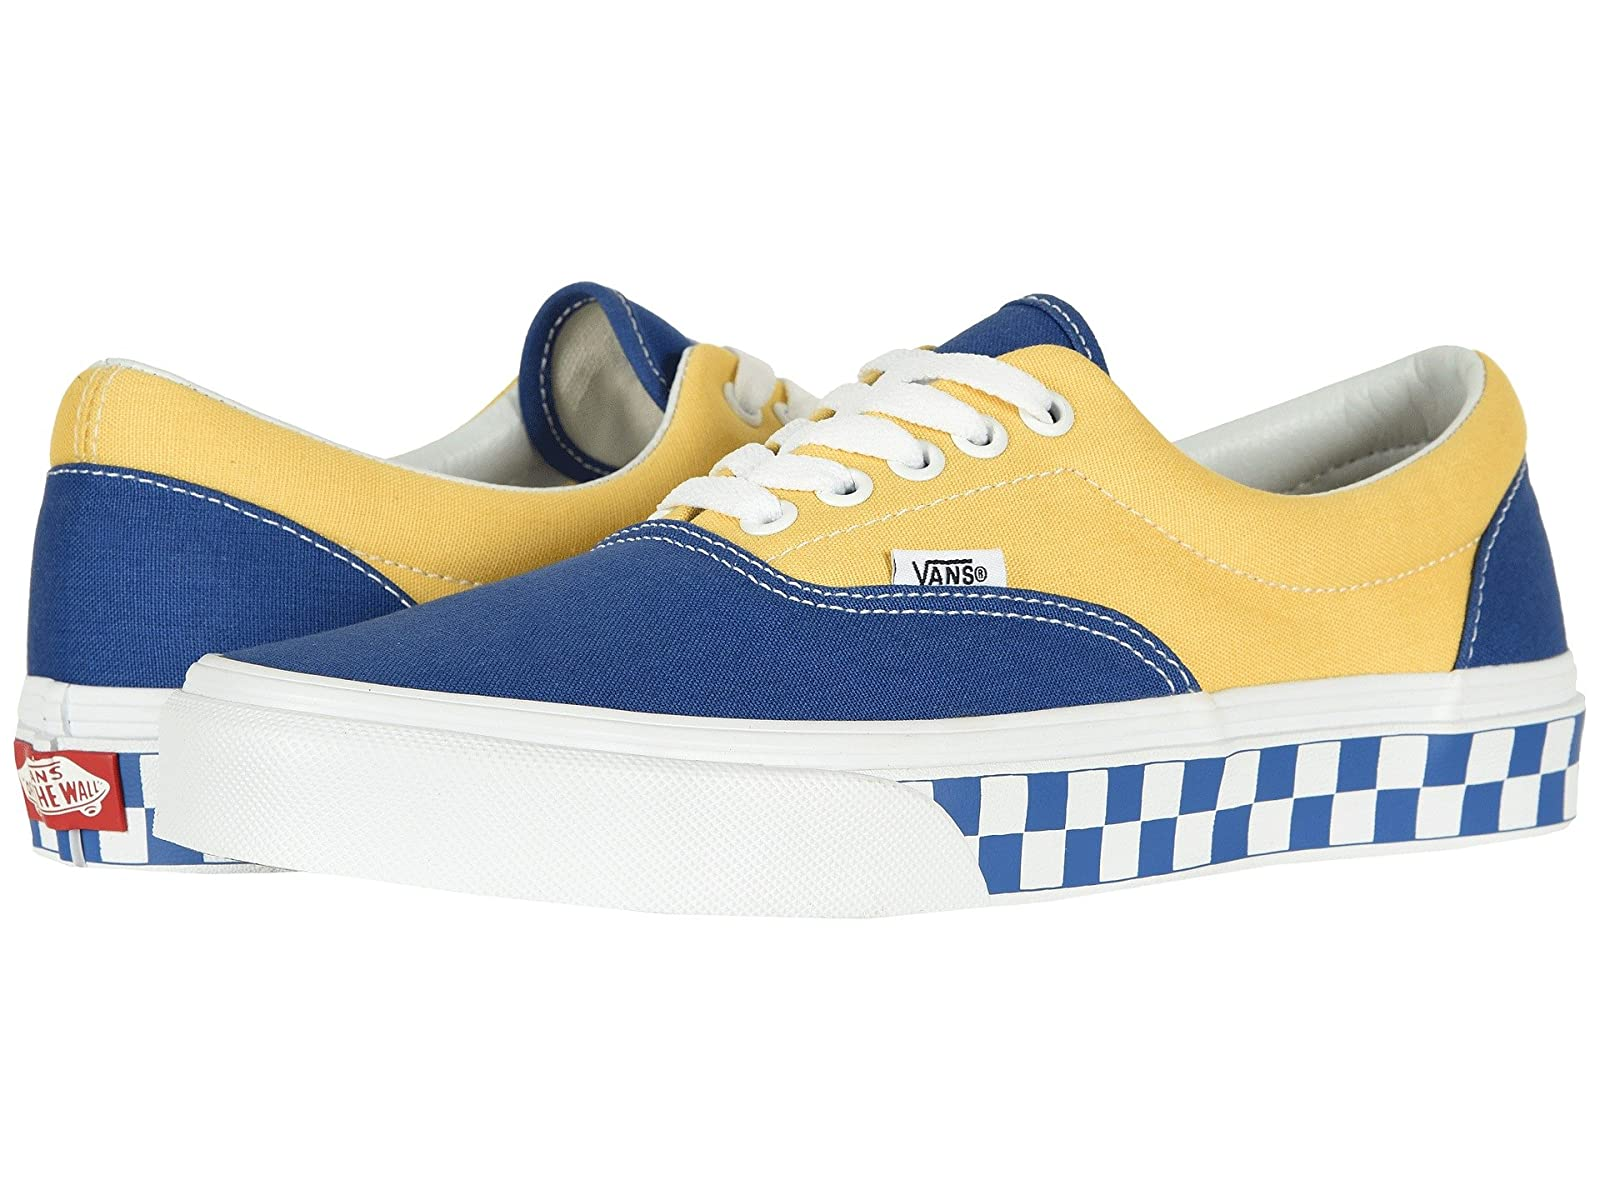 Vans Era™Atmospheric grades have affordable shoes